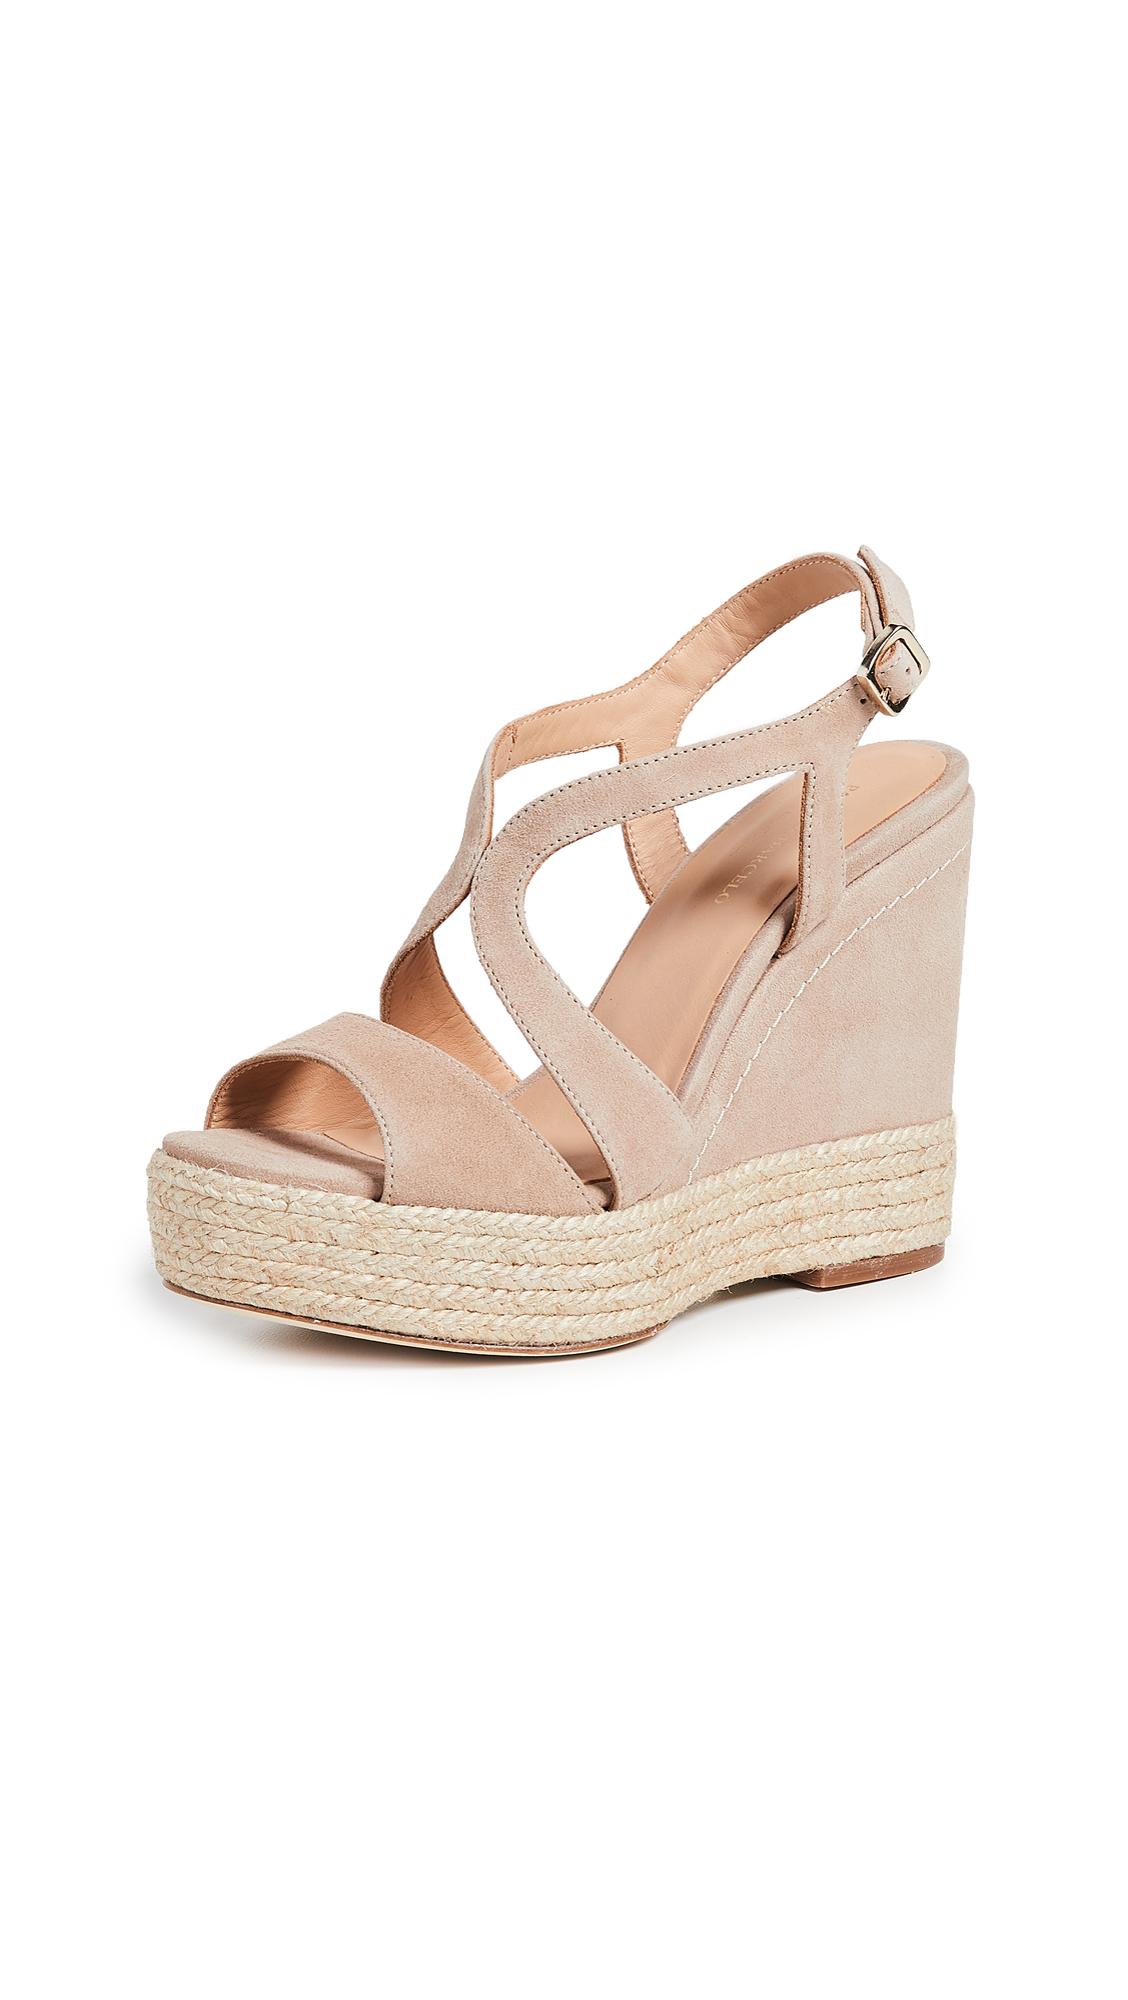 Buy Paloma Barcelo online - photo of Paloma Barcelo Mafafa Wedge Sandals